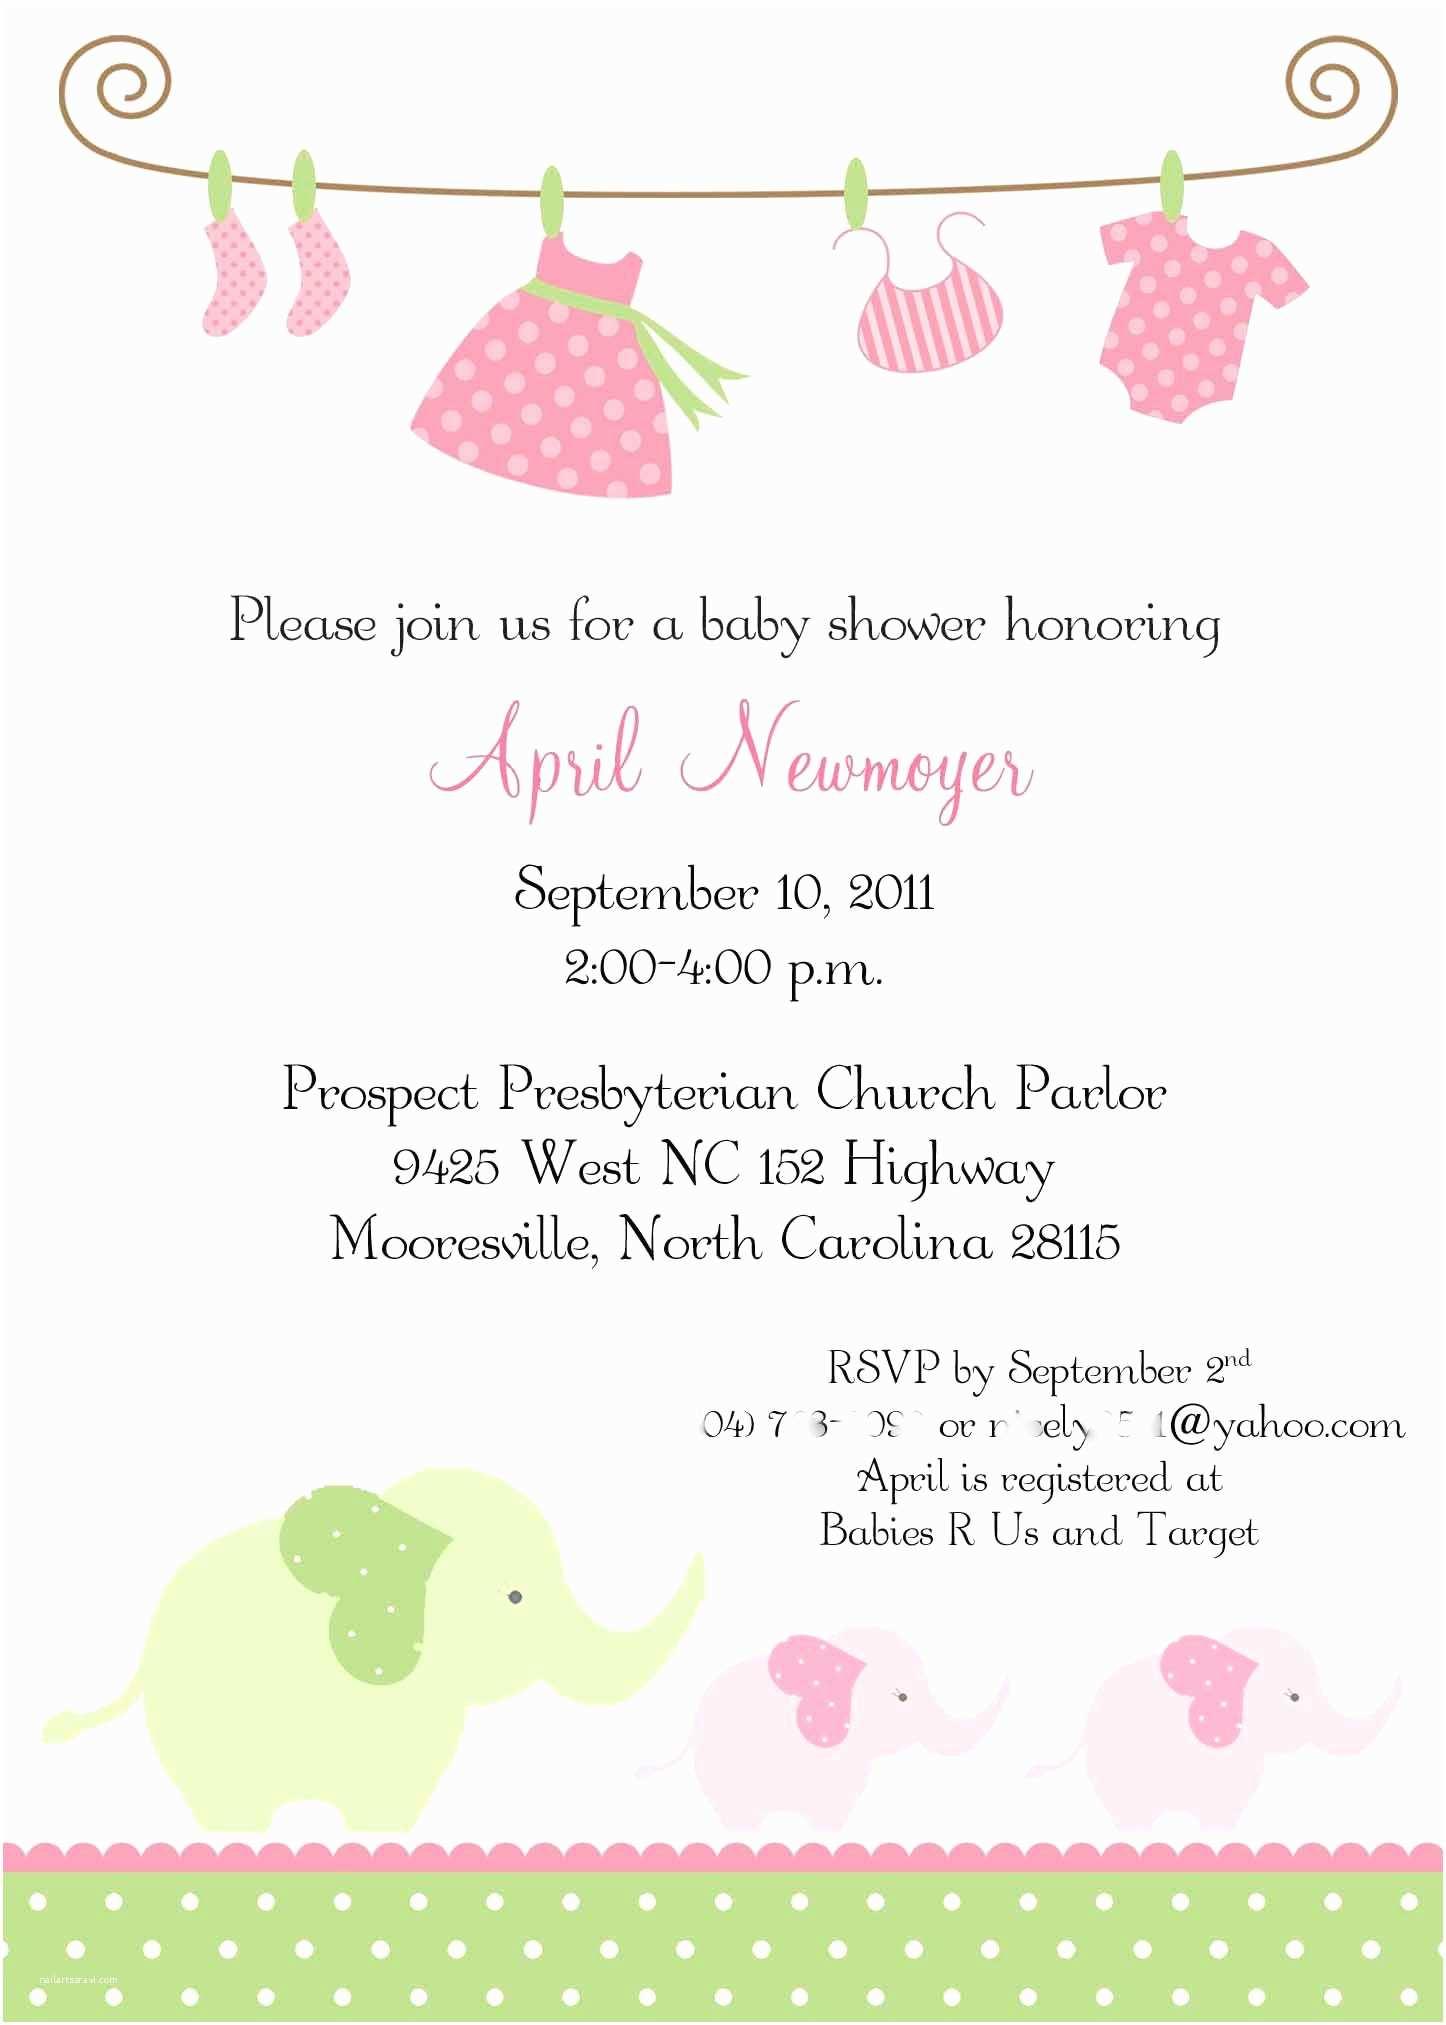 Girl Baby Shower Invitation Ideas Of Baby Shower Invitations for Girls